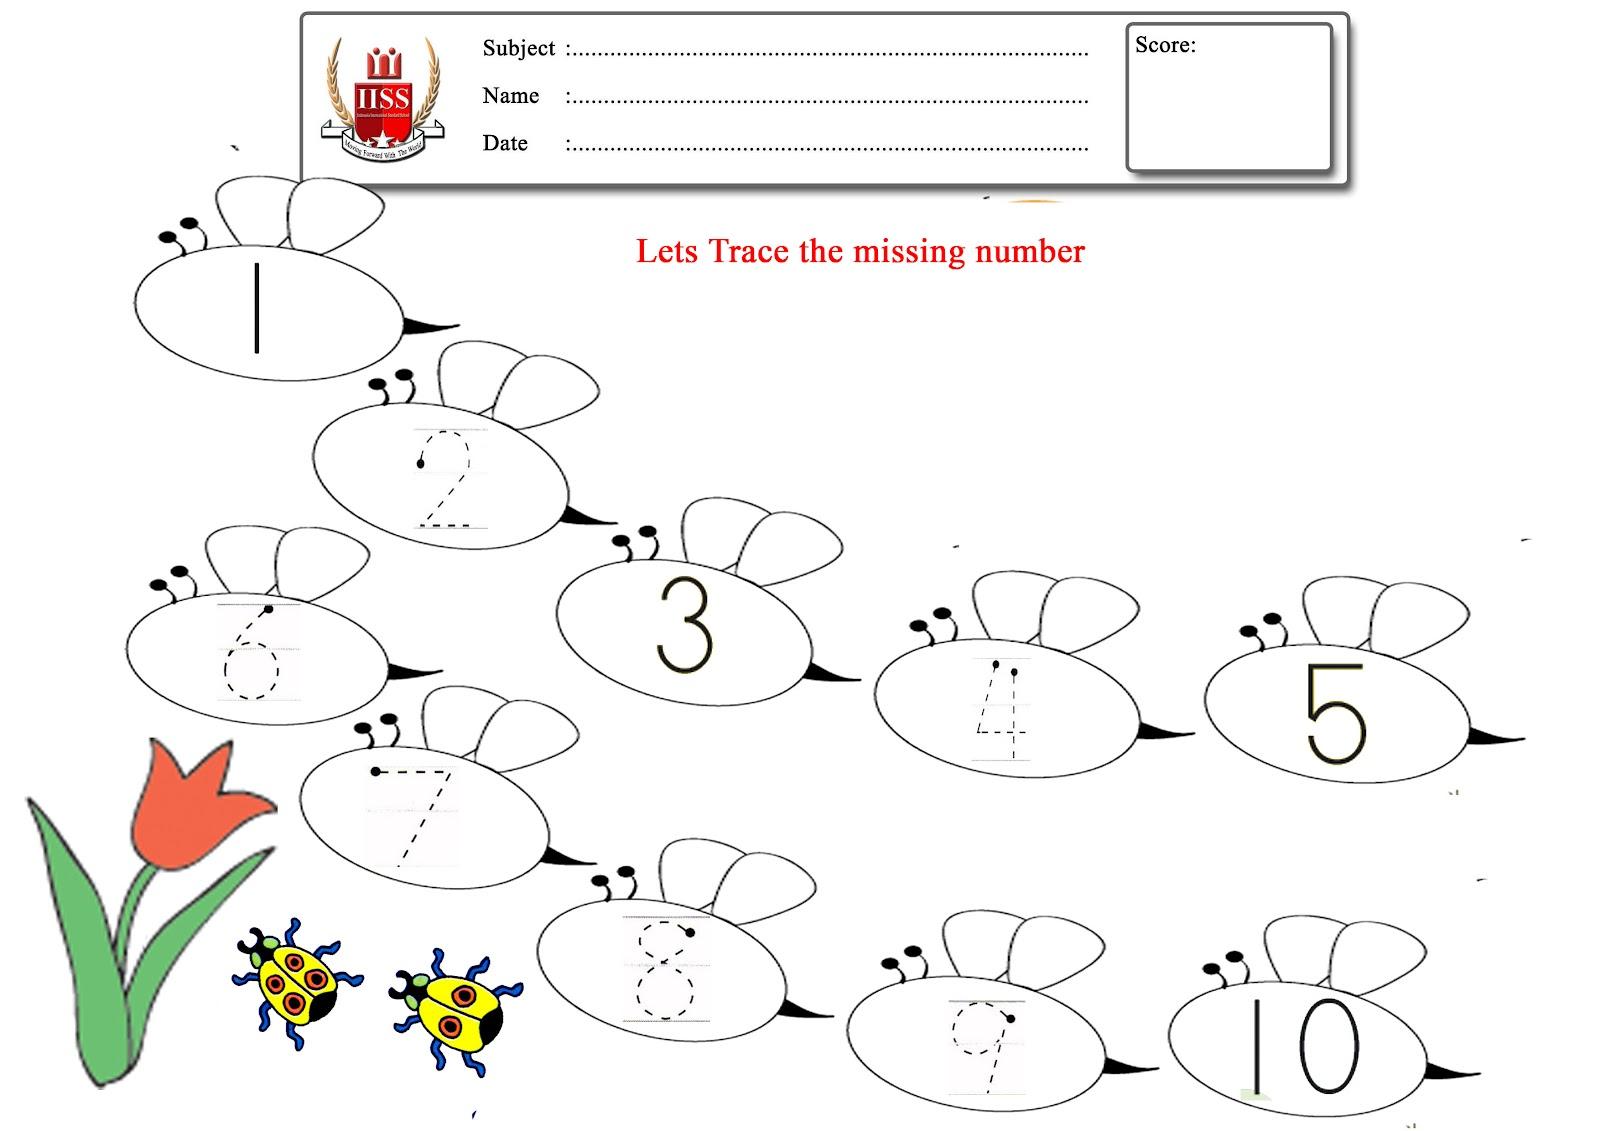 IISS: Butterfly Number Activity For Kindegarten